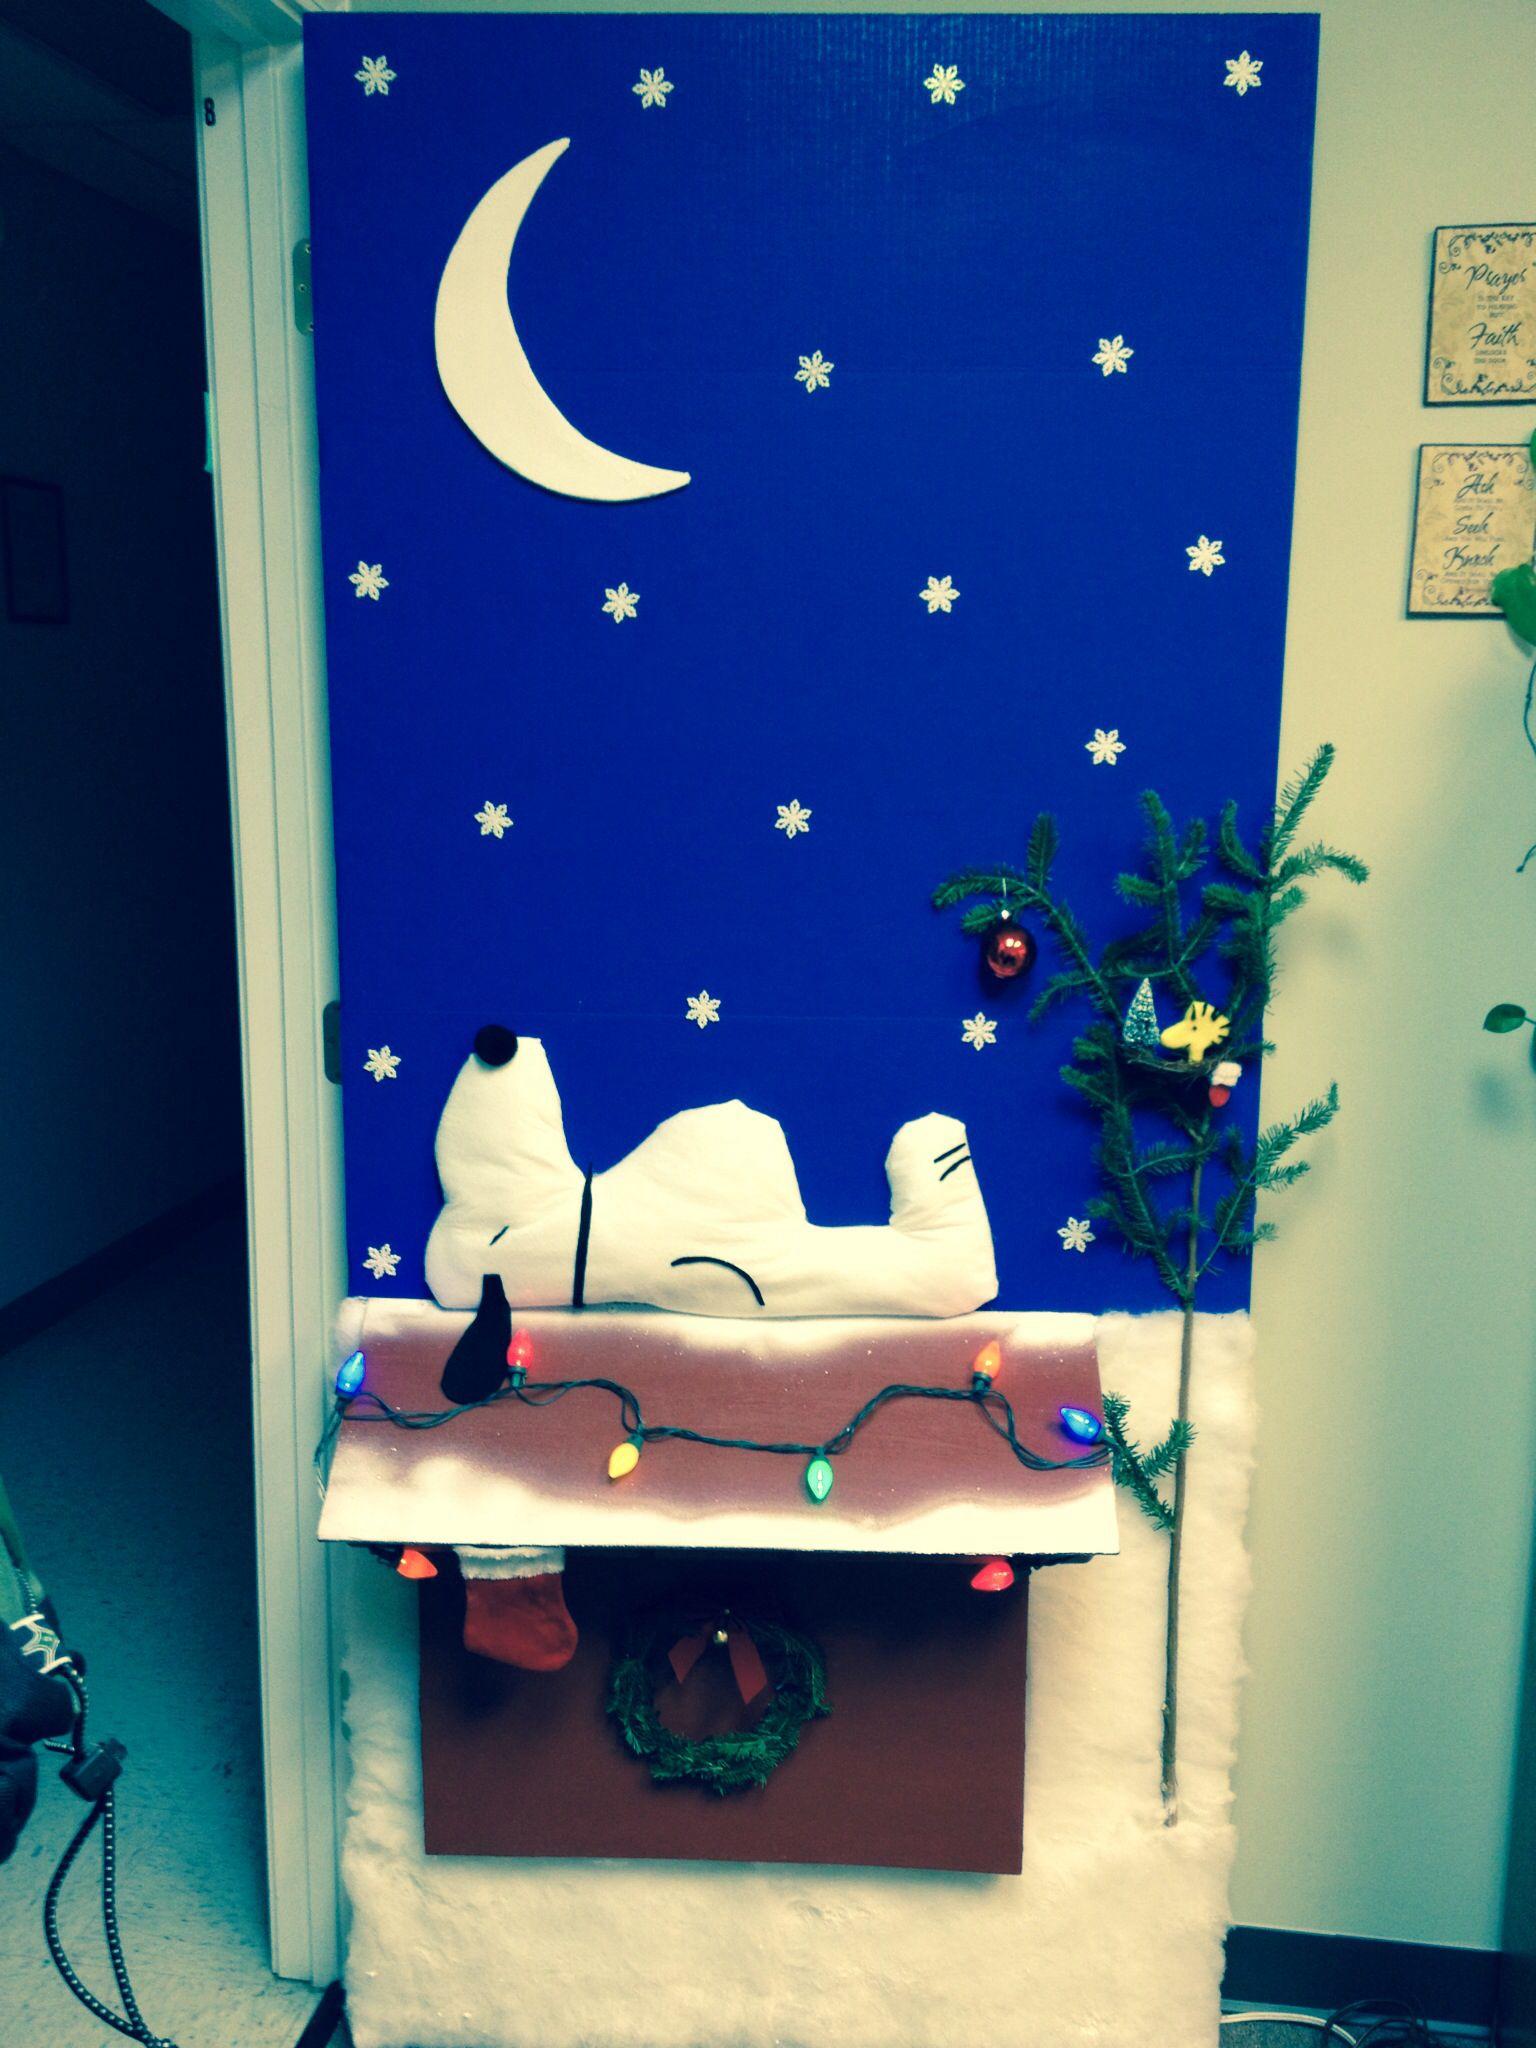 charlie brown christmas door decorating contest - Charlie Brown Christmas Decorations